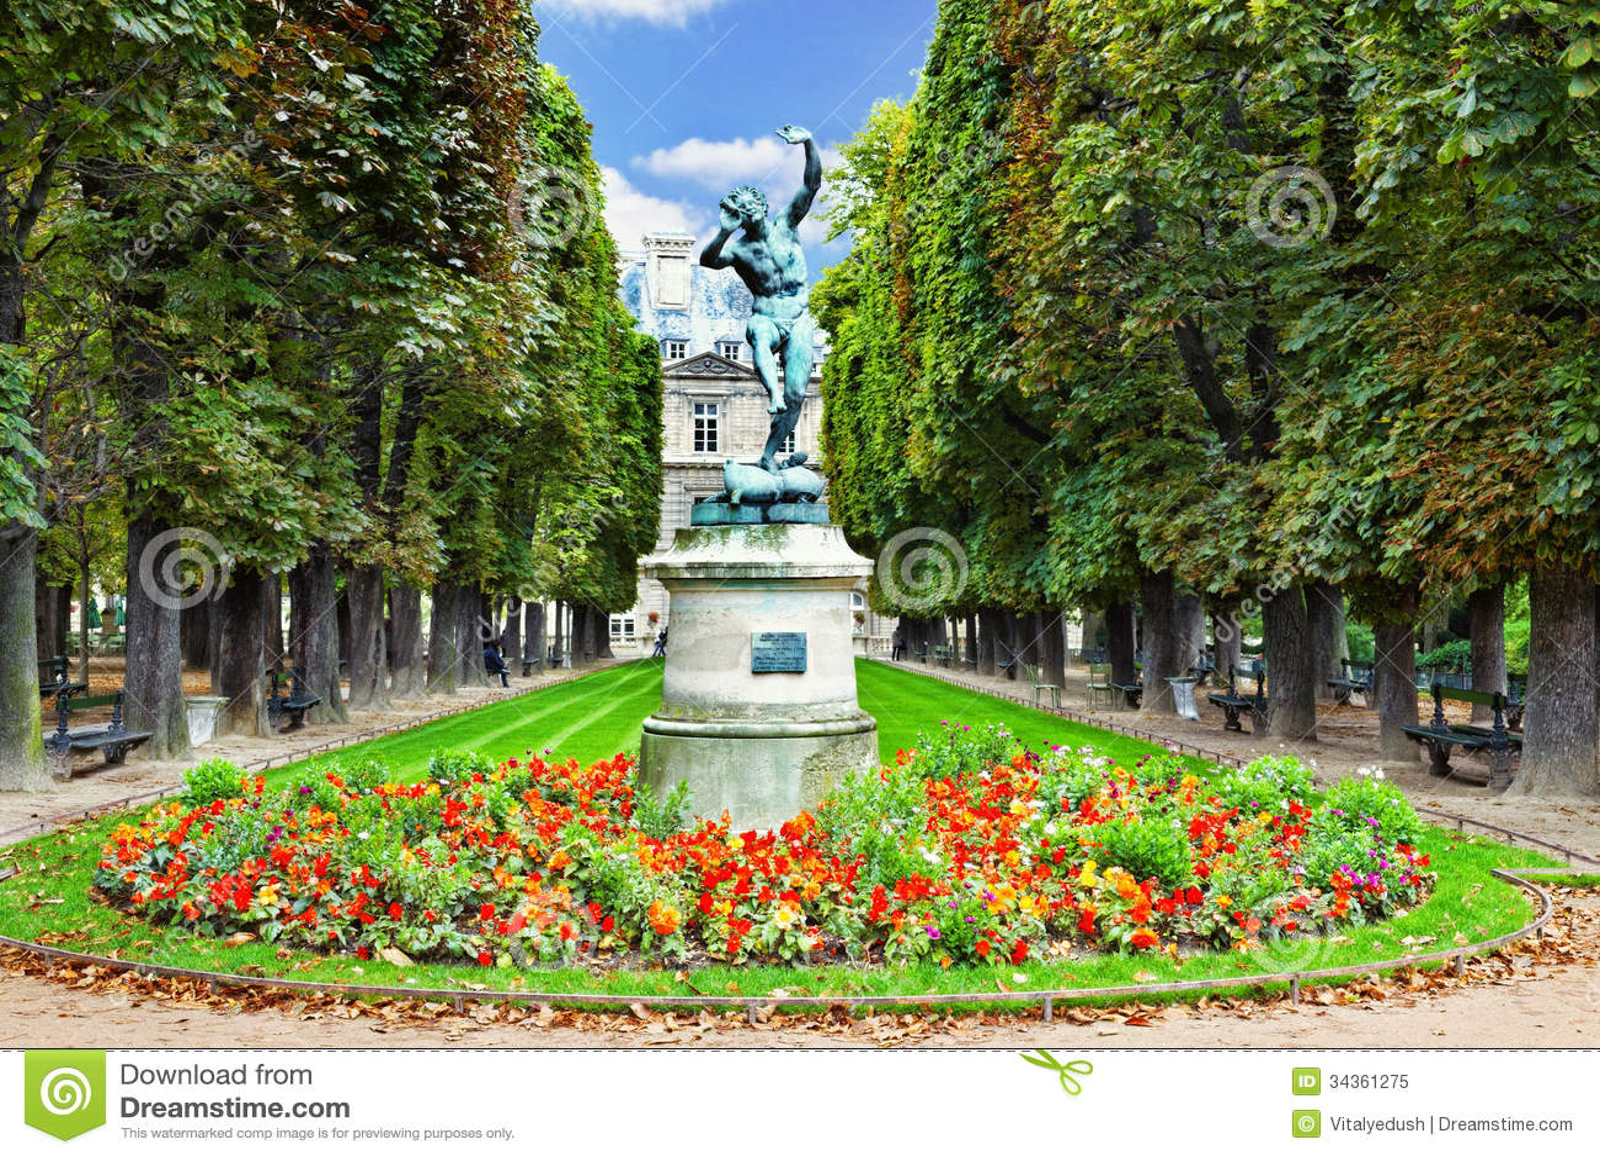 Dancing Faun. Luxembourg Garden(Jardin du Luxembourg) in Paris, France ...